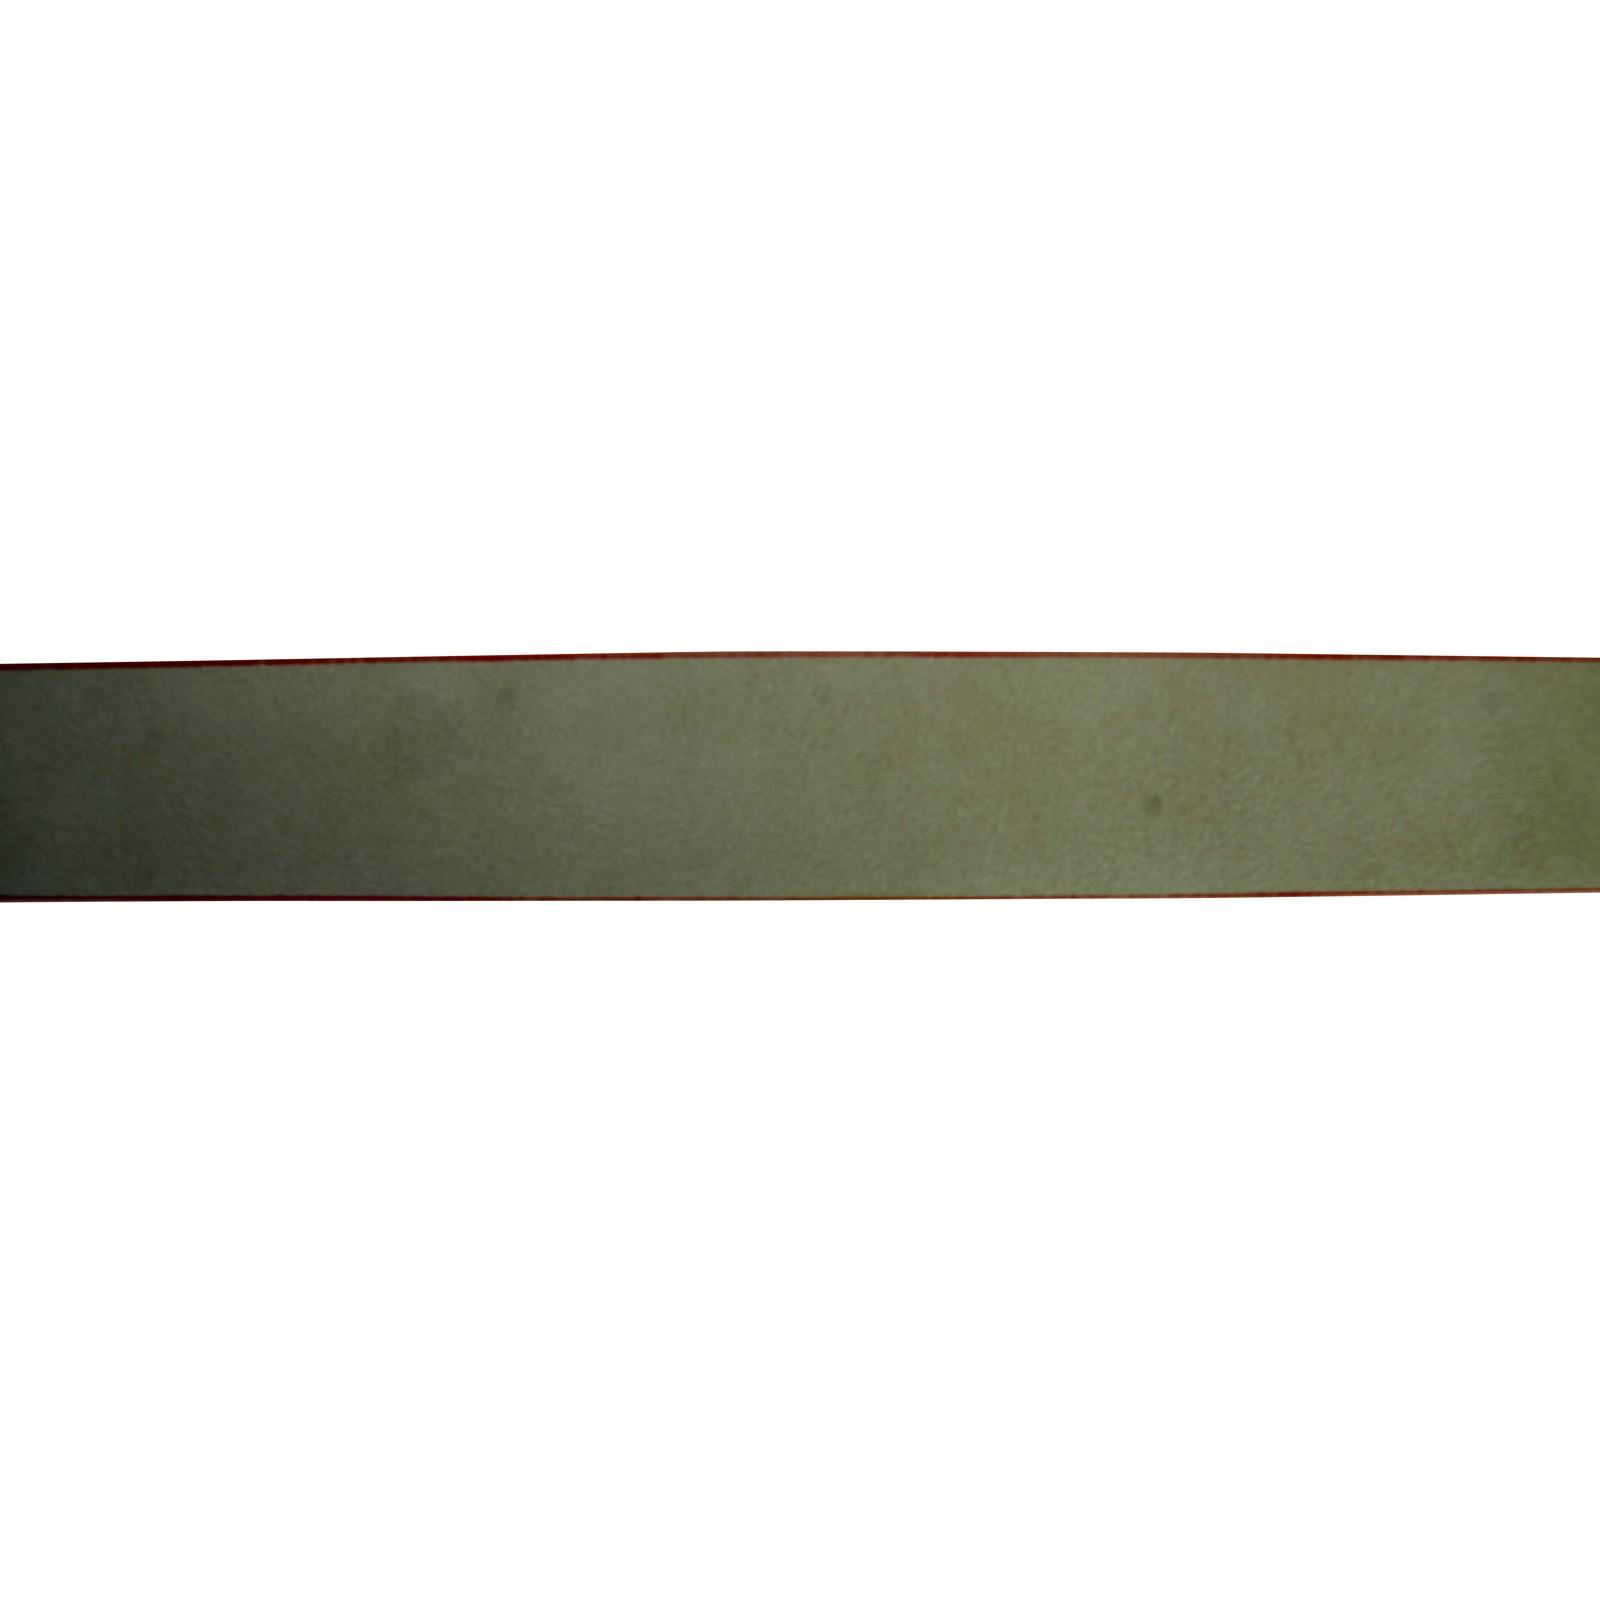 ceinture-ea7-emporio-armani-3 miniature 3